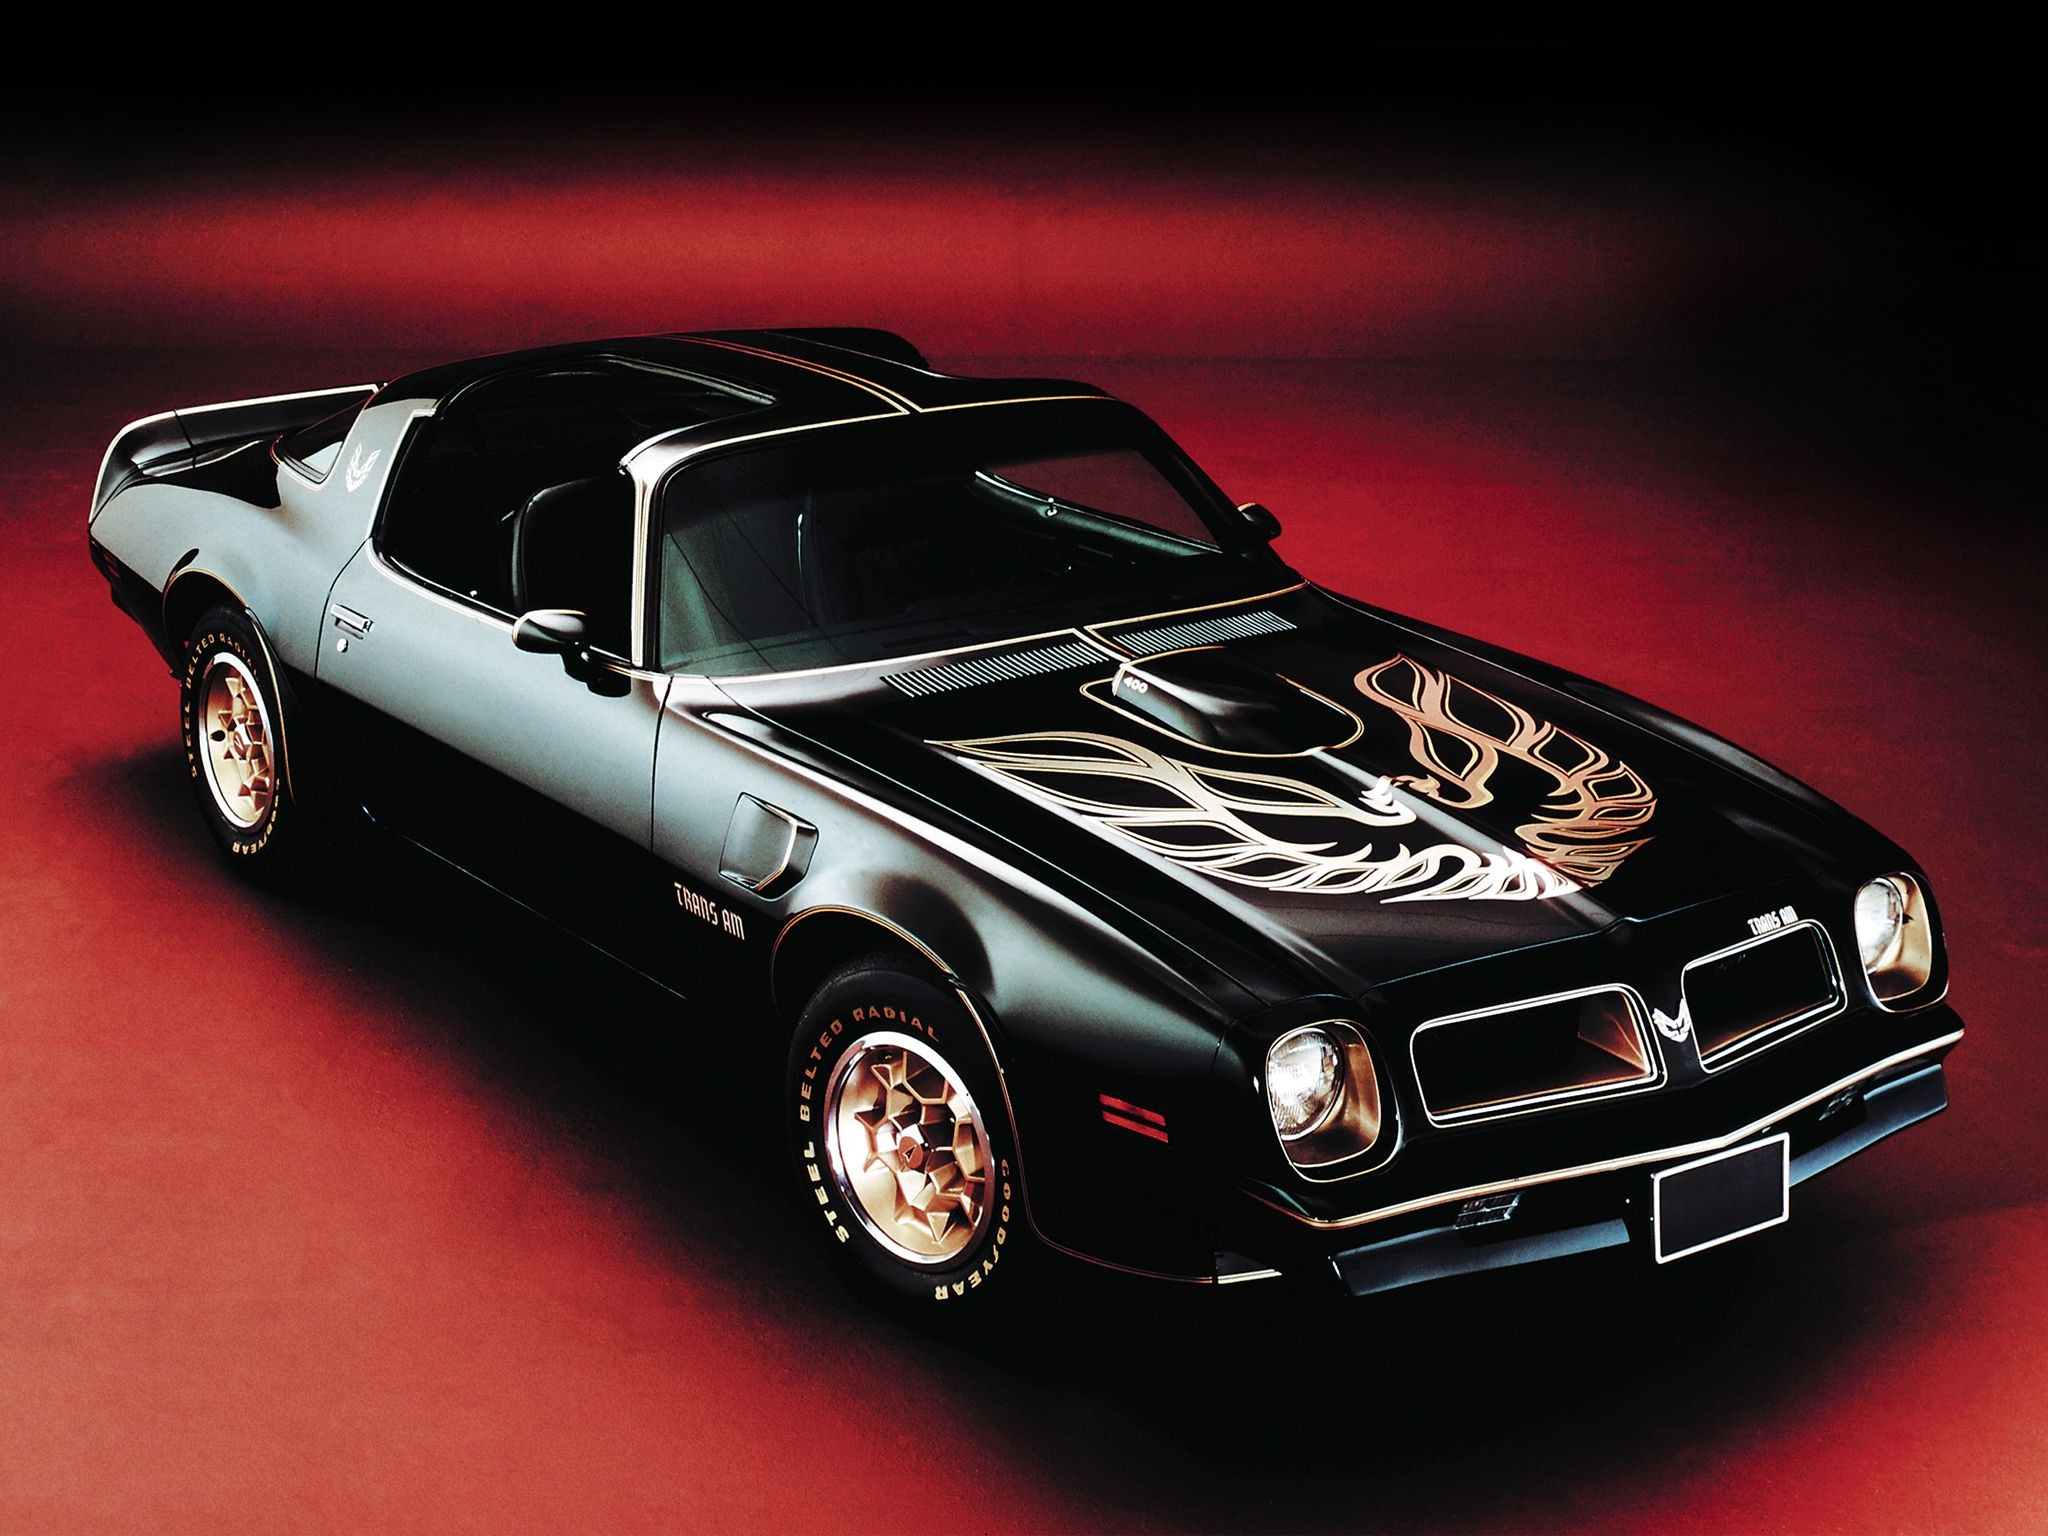 Res: 2048x1536, Pontiac Firebird Trans-am A-M L78 400 classic muscle wallpaper background